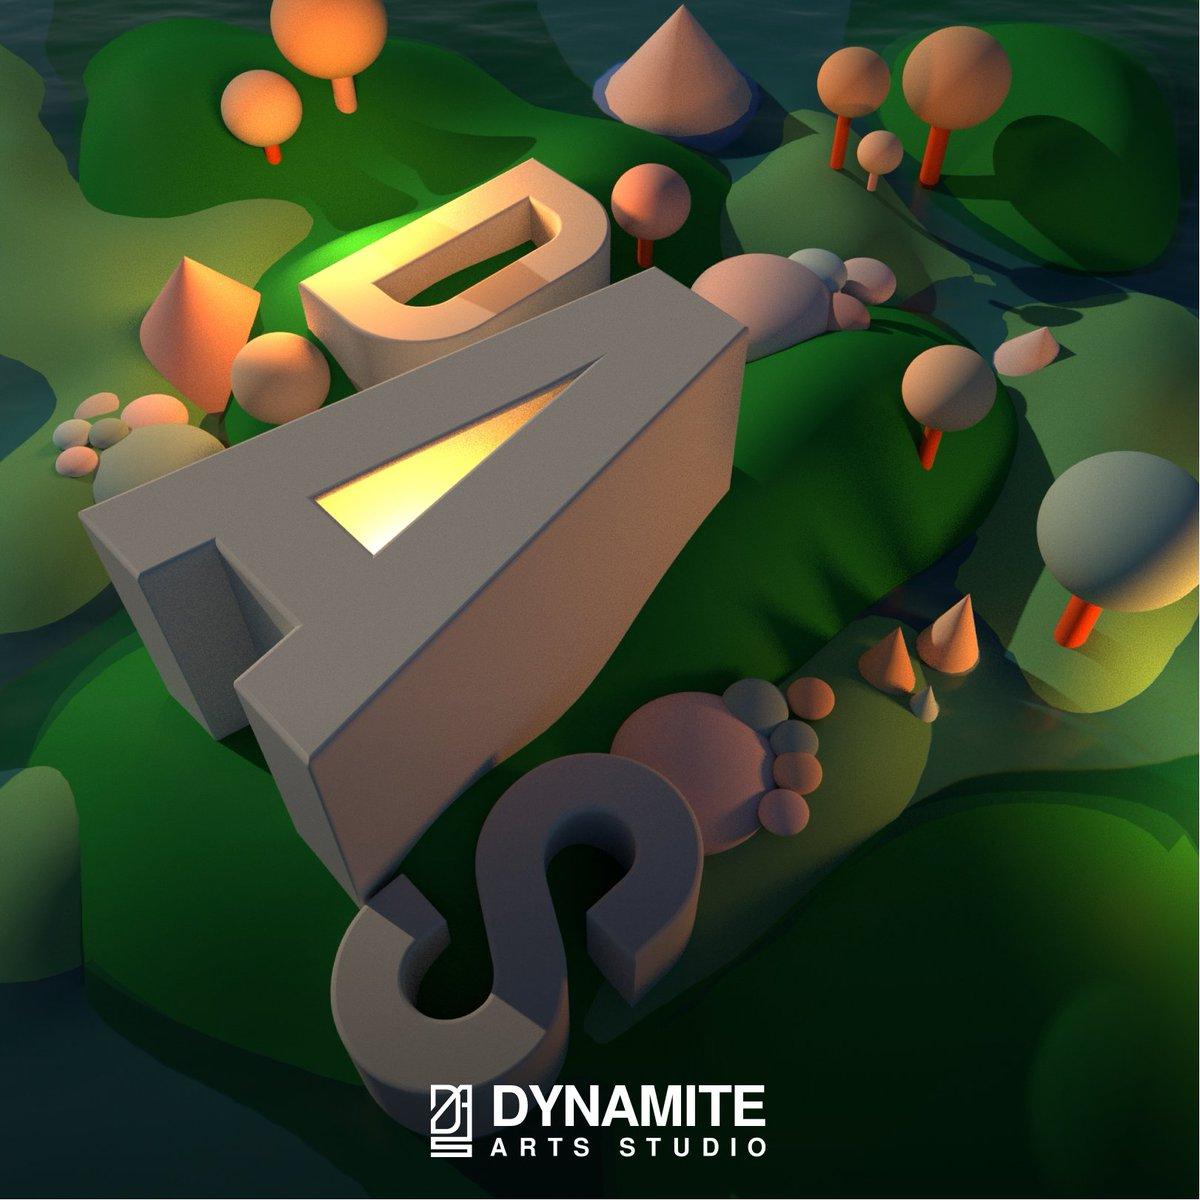 BTS of DAS - Dynamite Arts Studio #3dart  #cinema4d , #ArnoldRender, #Photoshop  #3dmodeling  #3Dartist  #3DModel  #3drender  #3ddesign  #artistontwittter  #designer #designers   #cartoon #CartoonArt  #modernart #designthinking #designinspiration #artwork #stylized